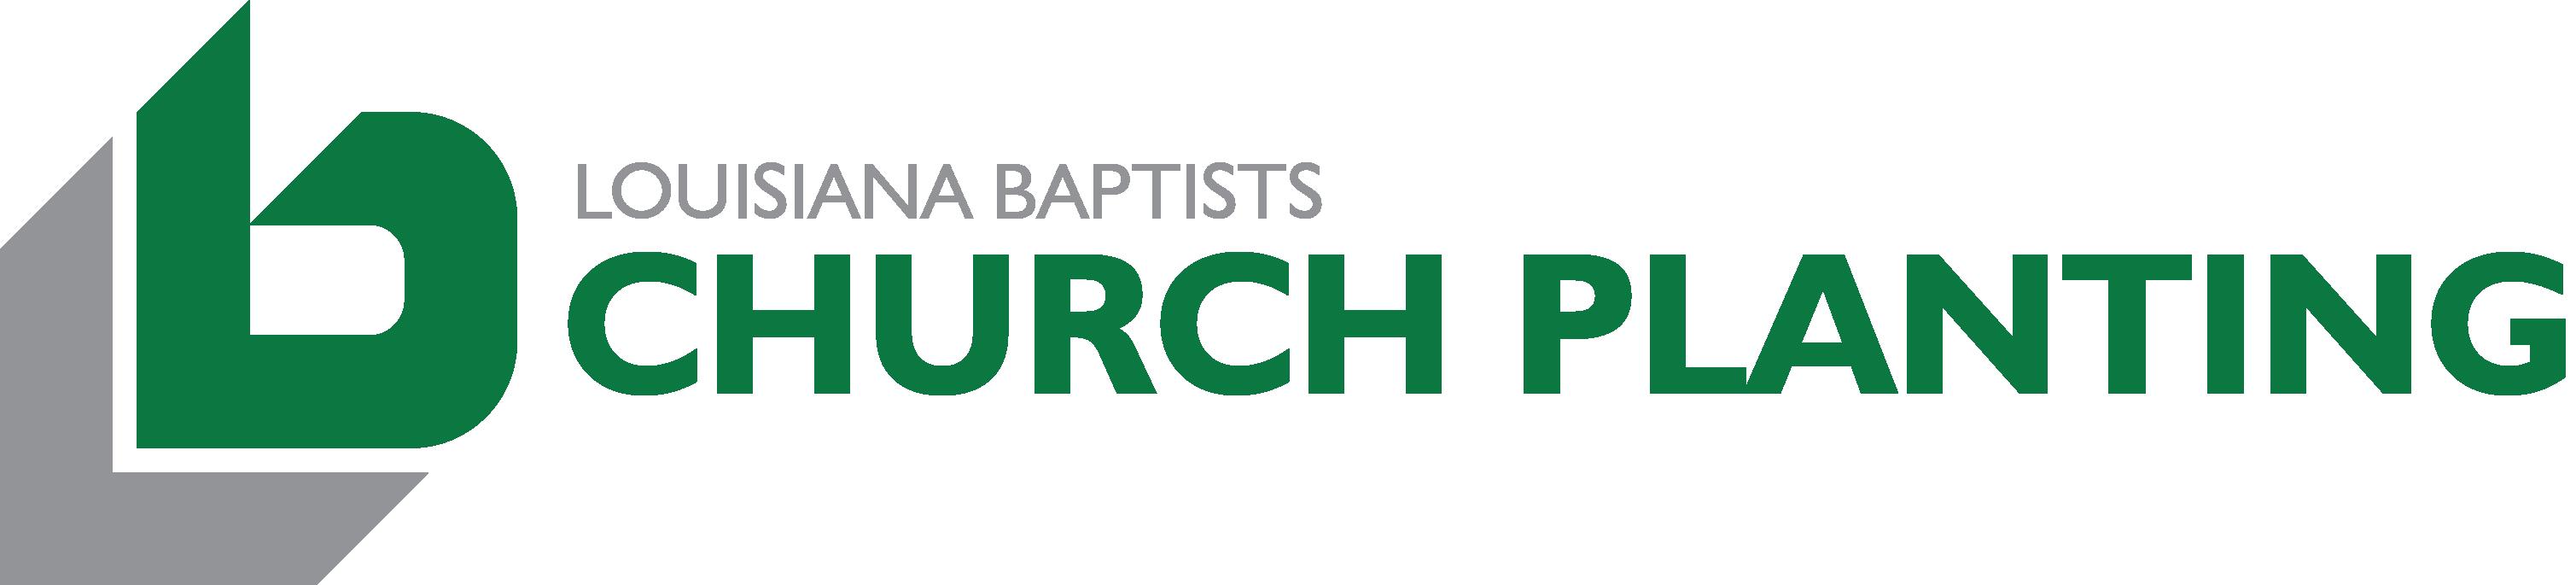 lb_church_planting_ved.png